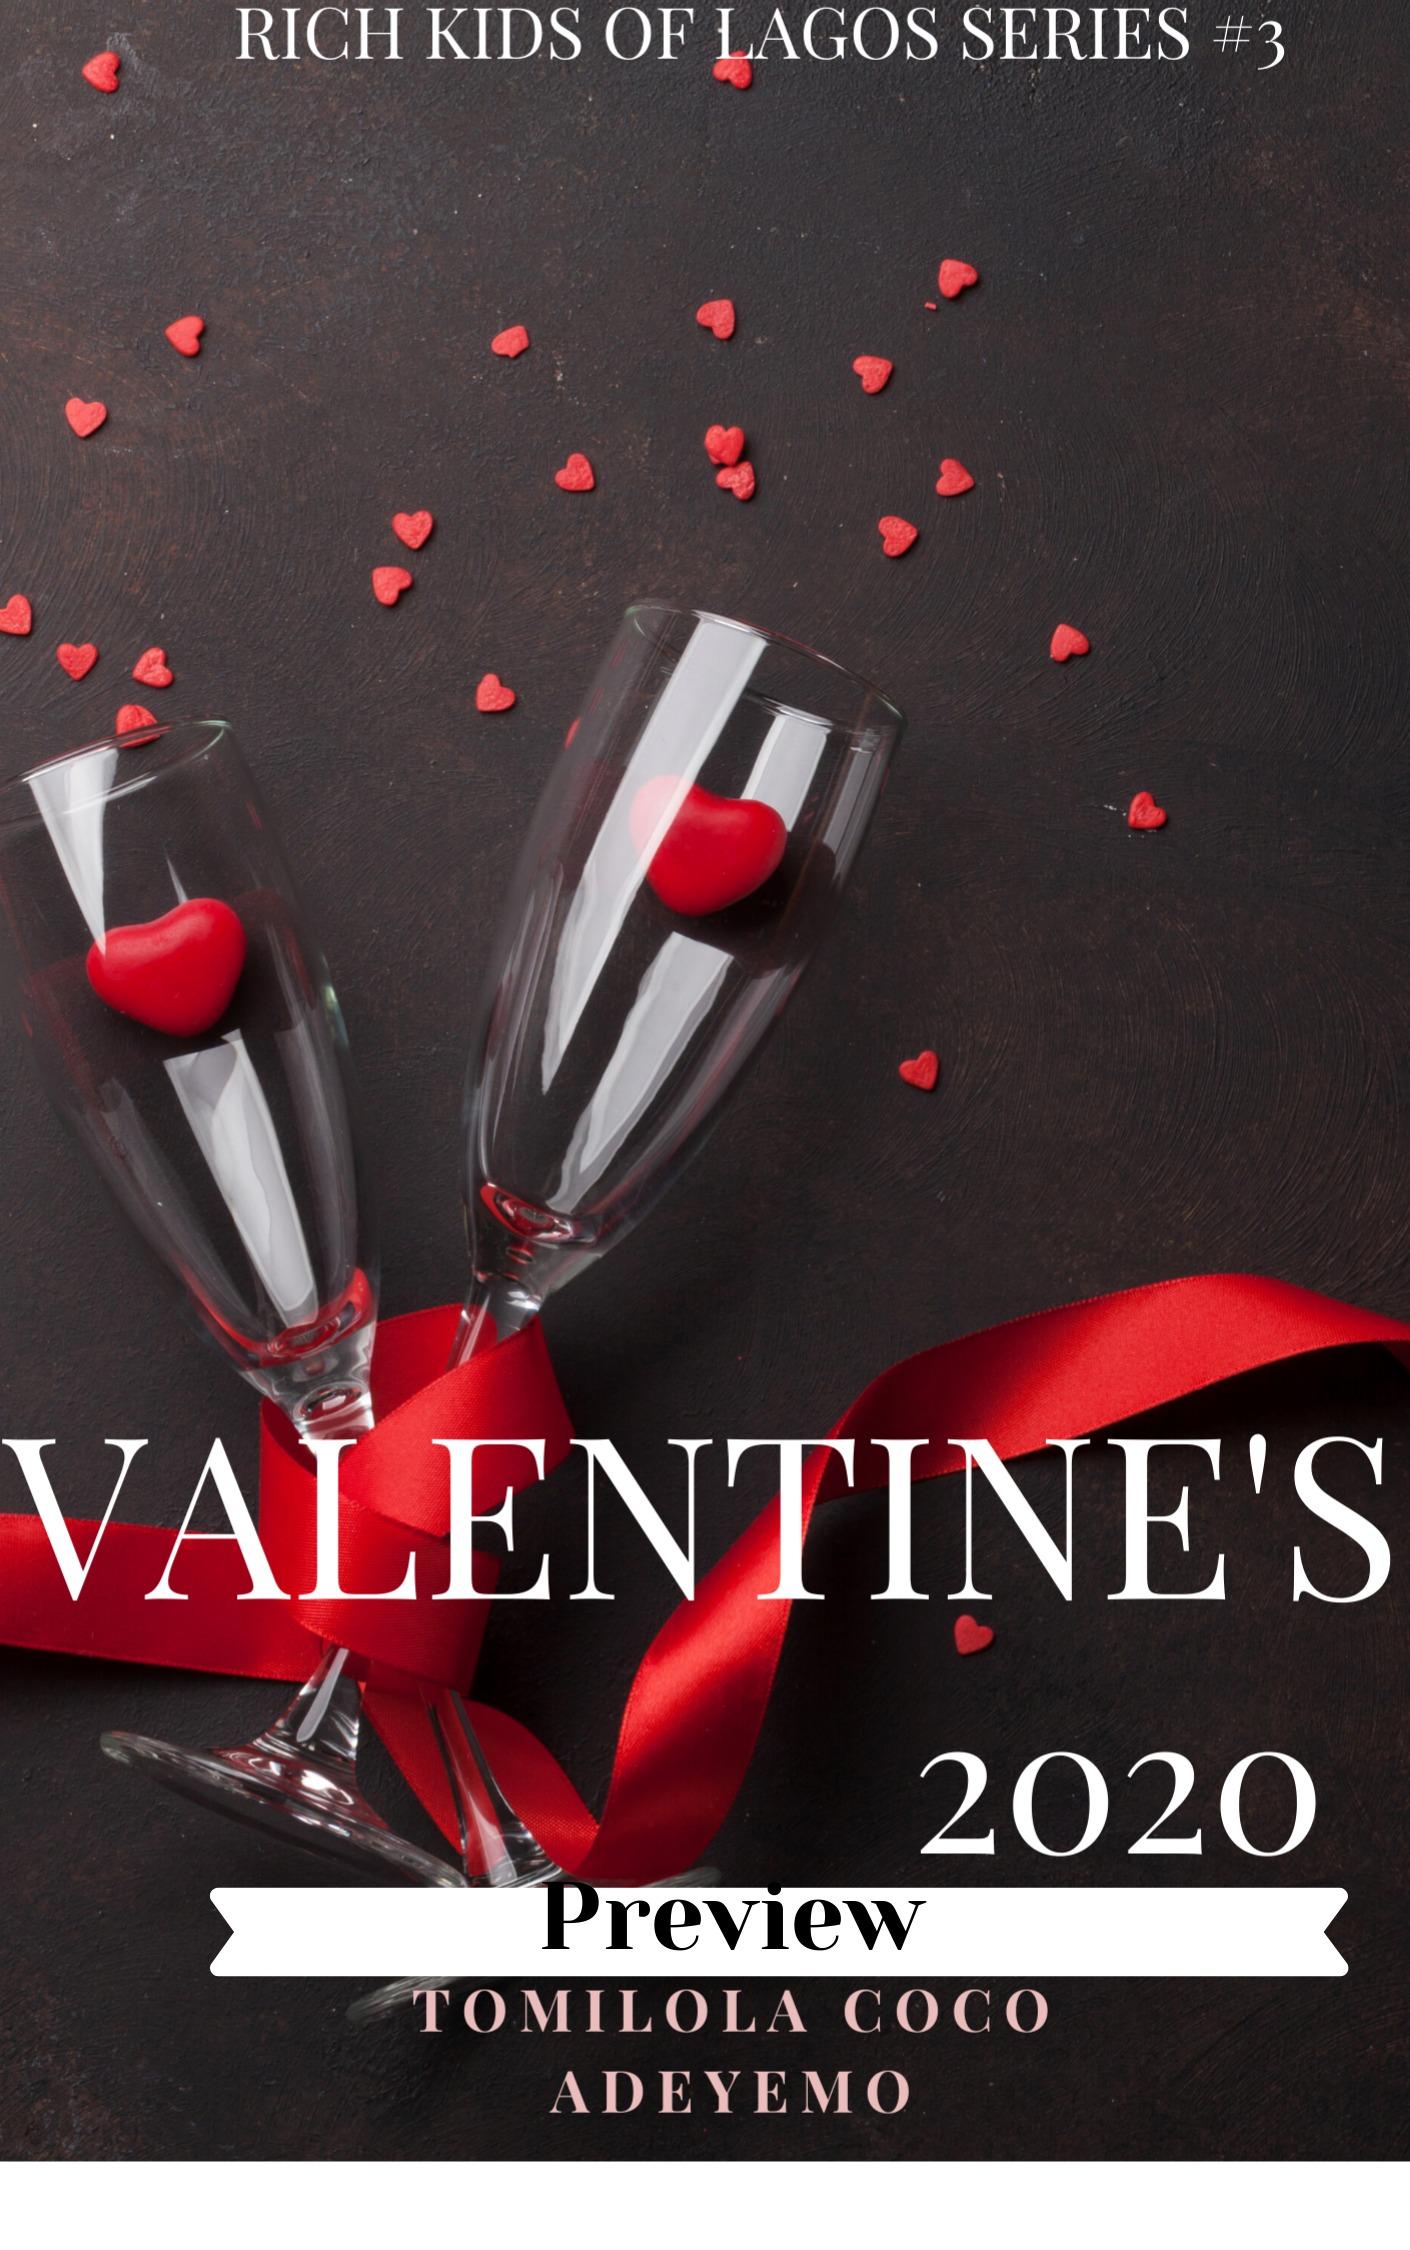 Valentine's 2020 [PREVIEW]